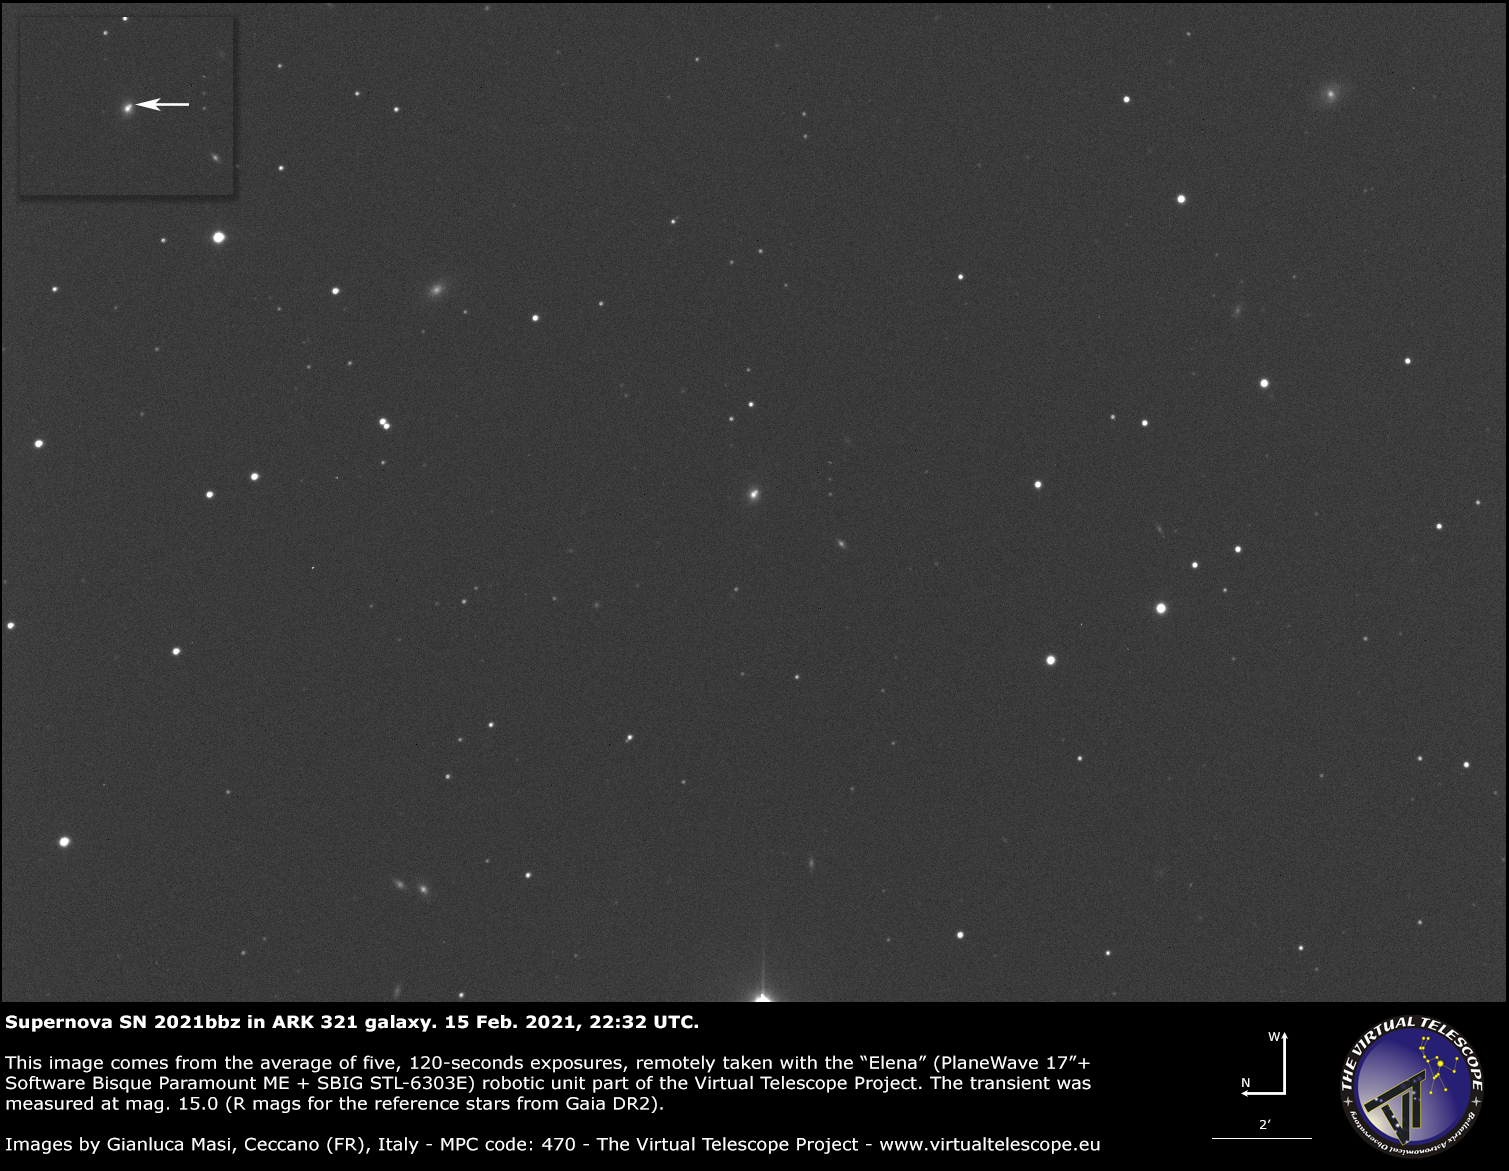 Supernova SN 2021bbz in ARK 321 galaxy: 15 Feb. 2021.